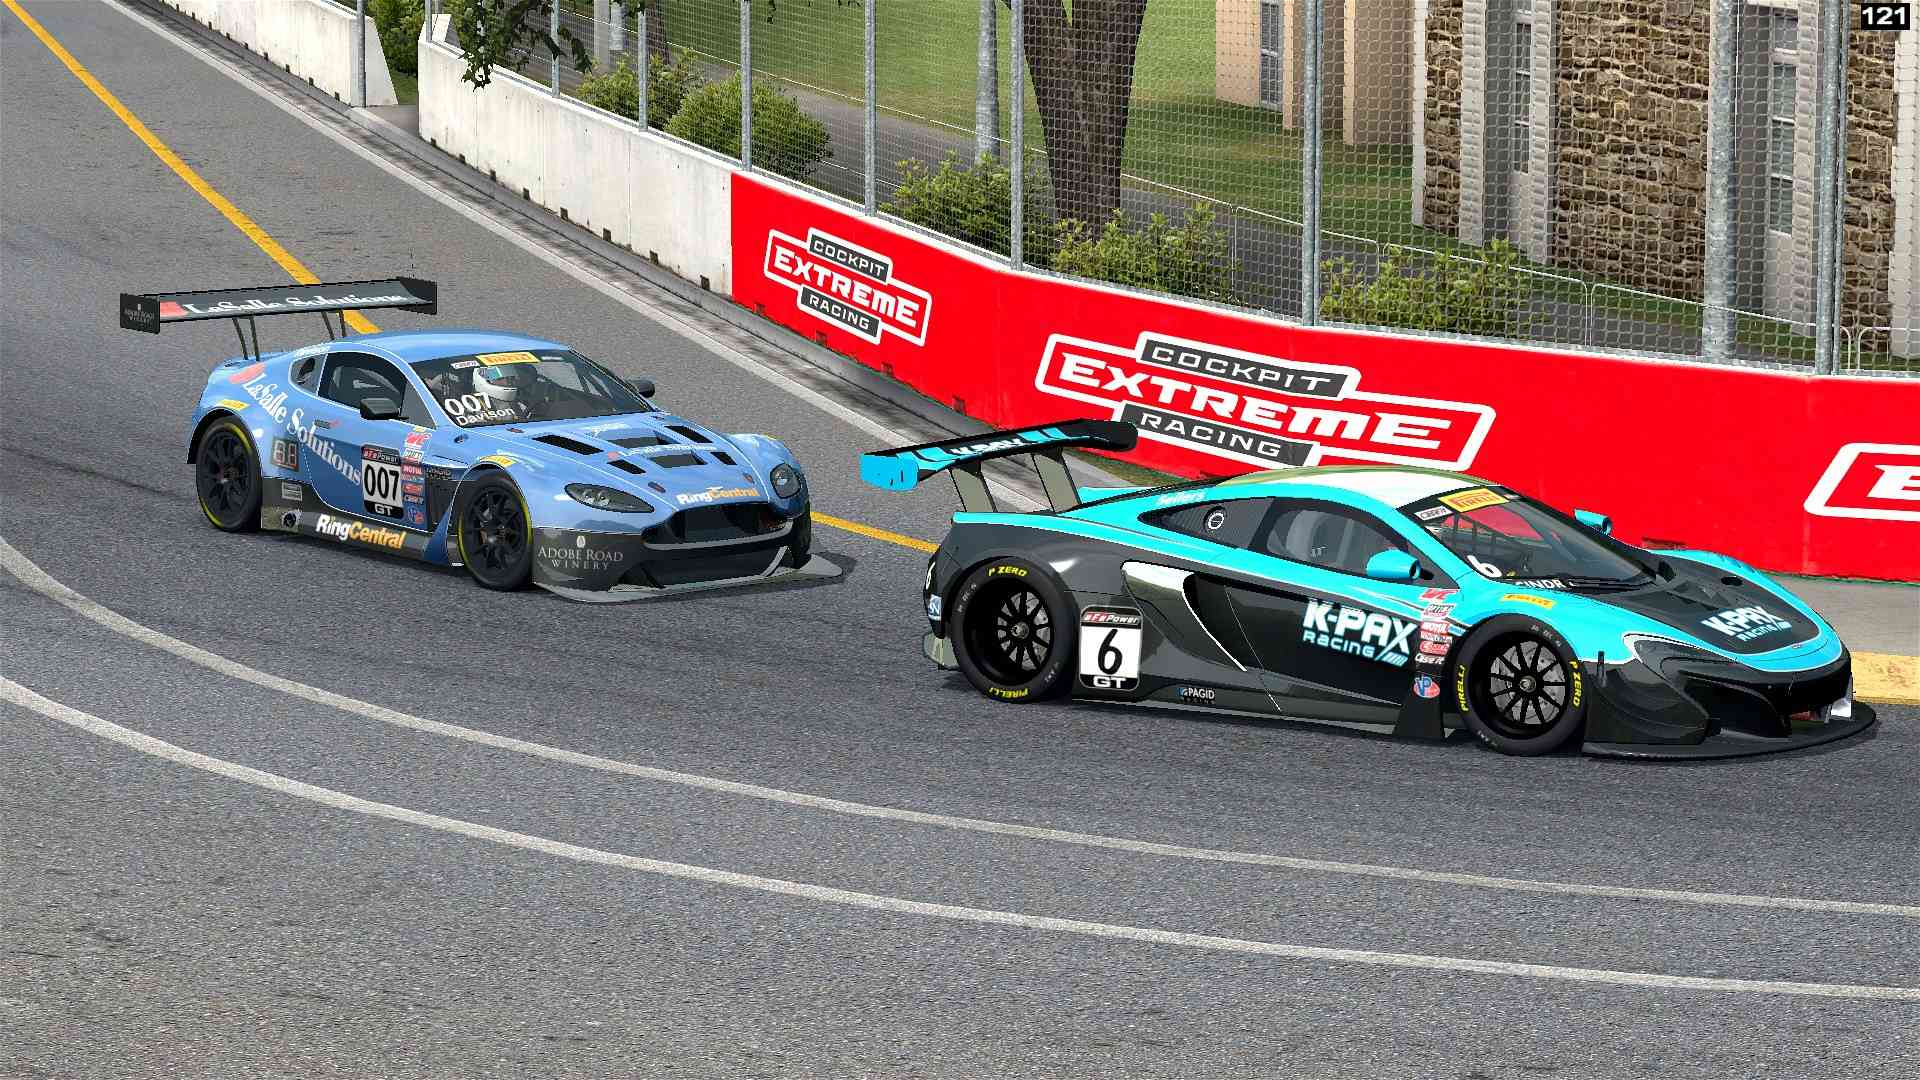 AMS Pirelli World Challenge 2017 v0.6 - Released 20170413